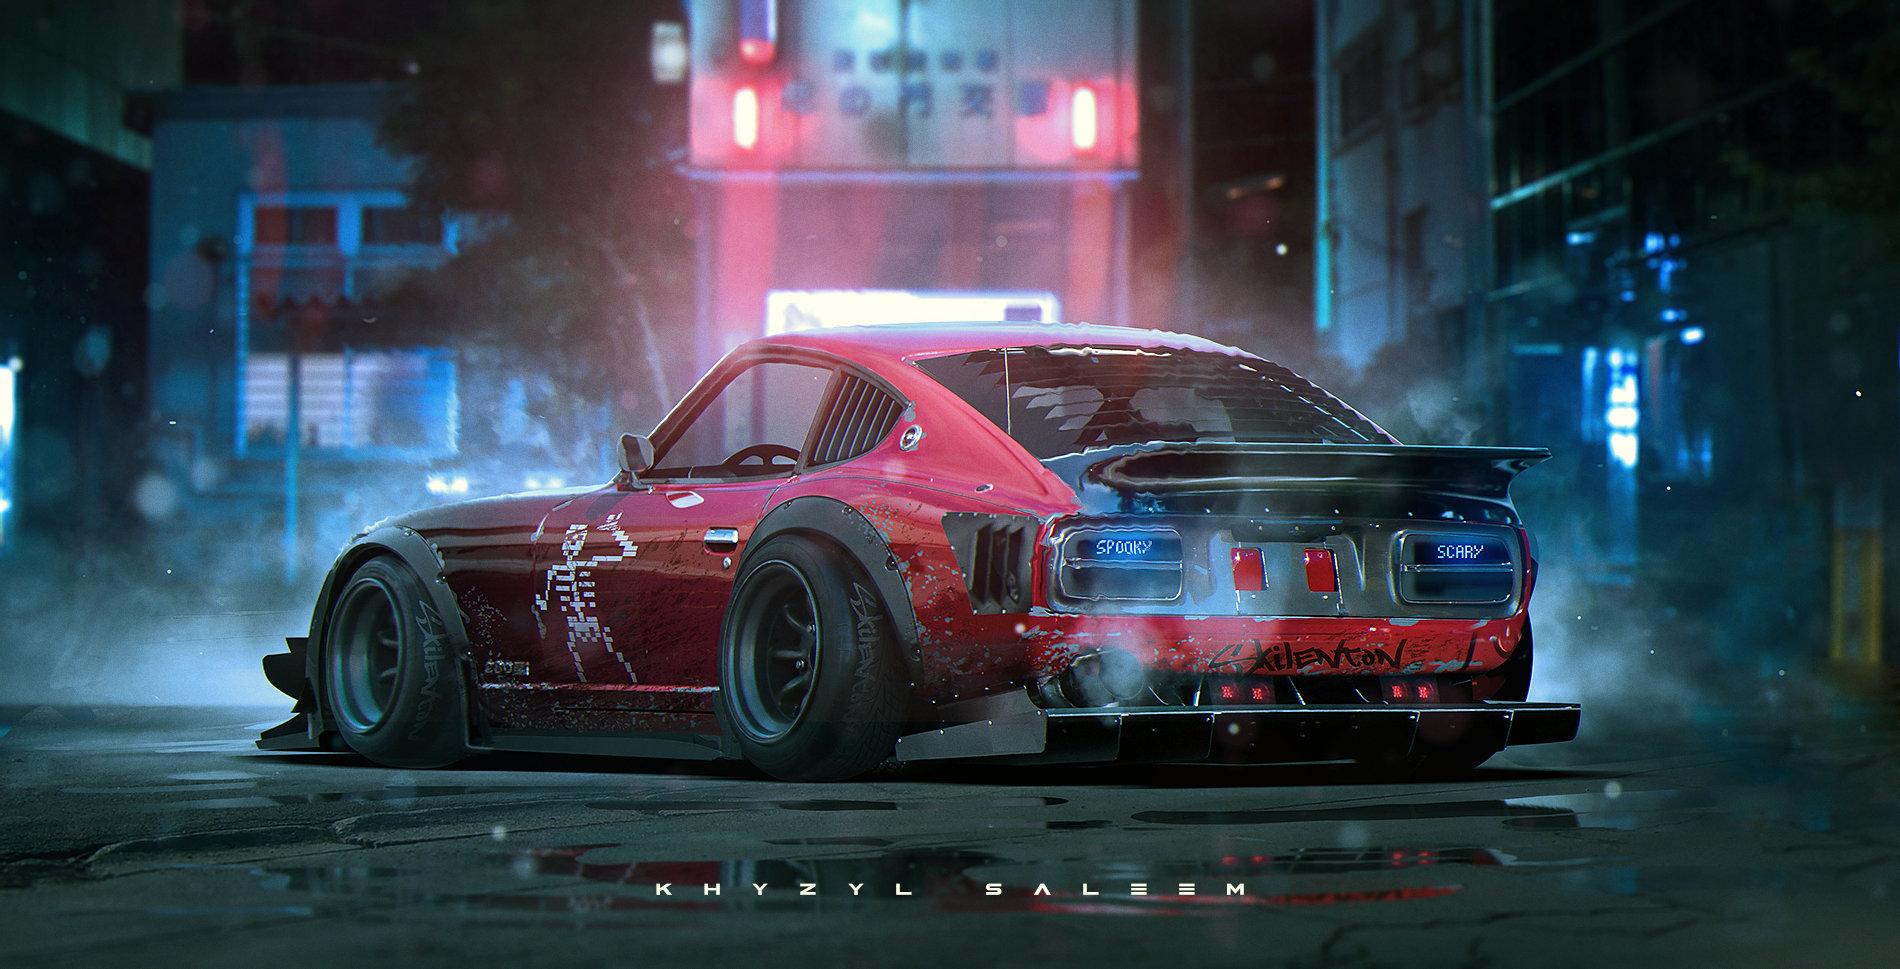 Nissan Fairlady Z >> ArtStation - Simple Z, Khyzyl Saleem